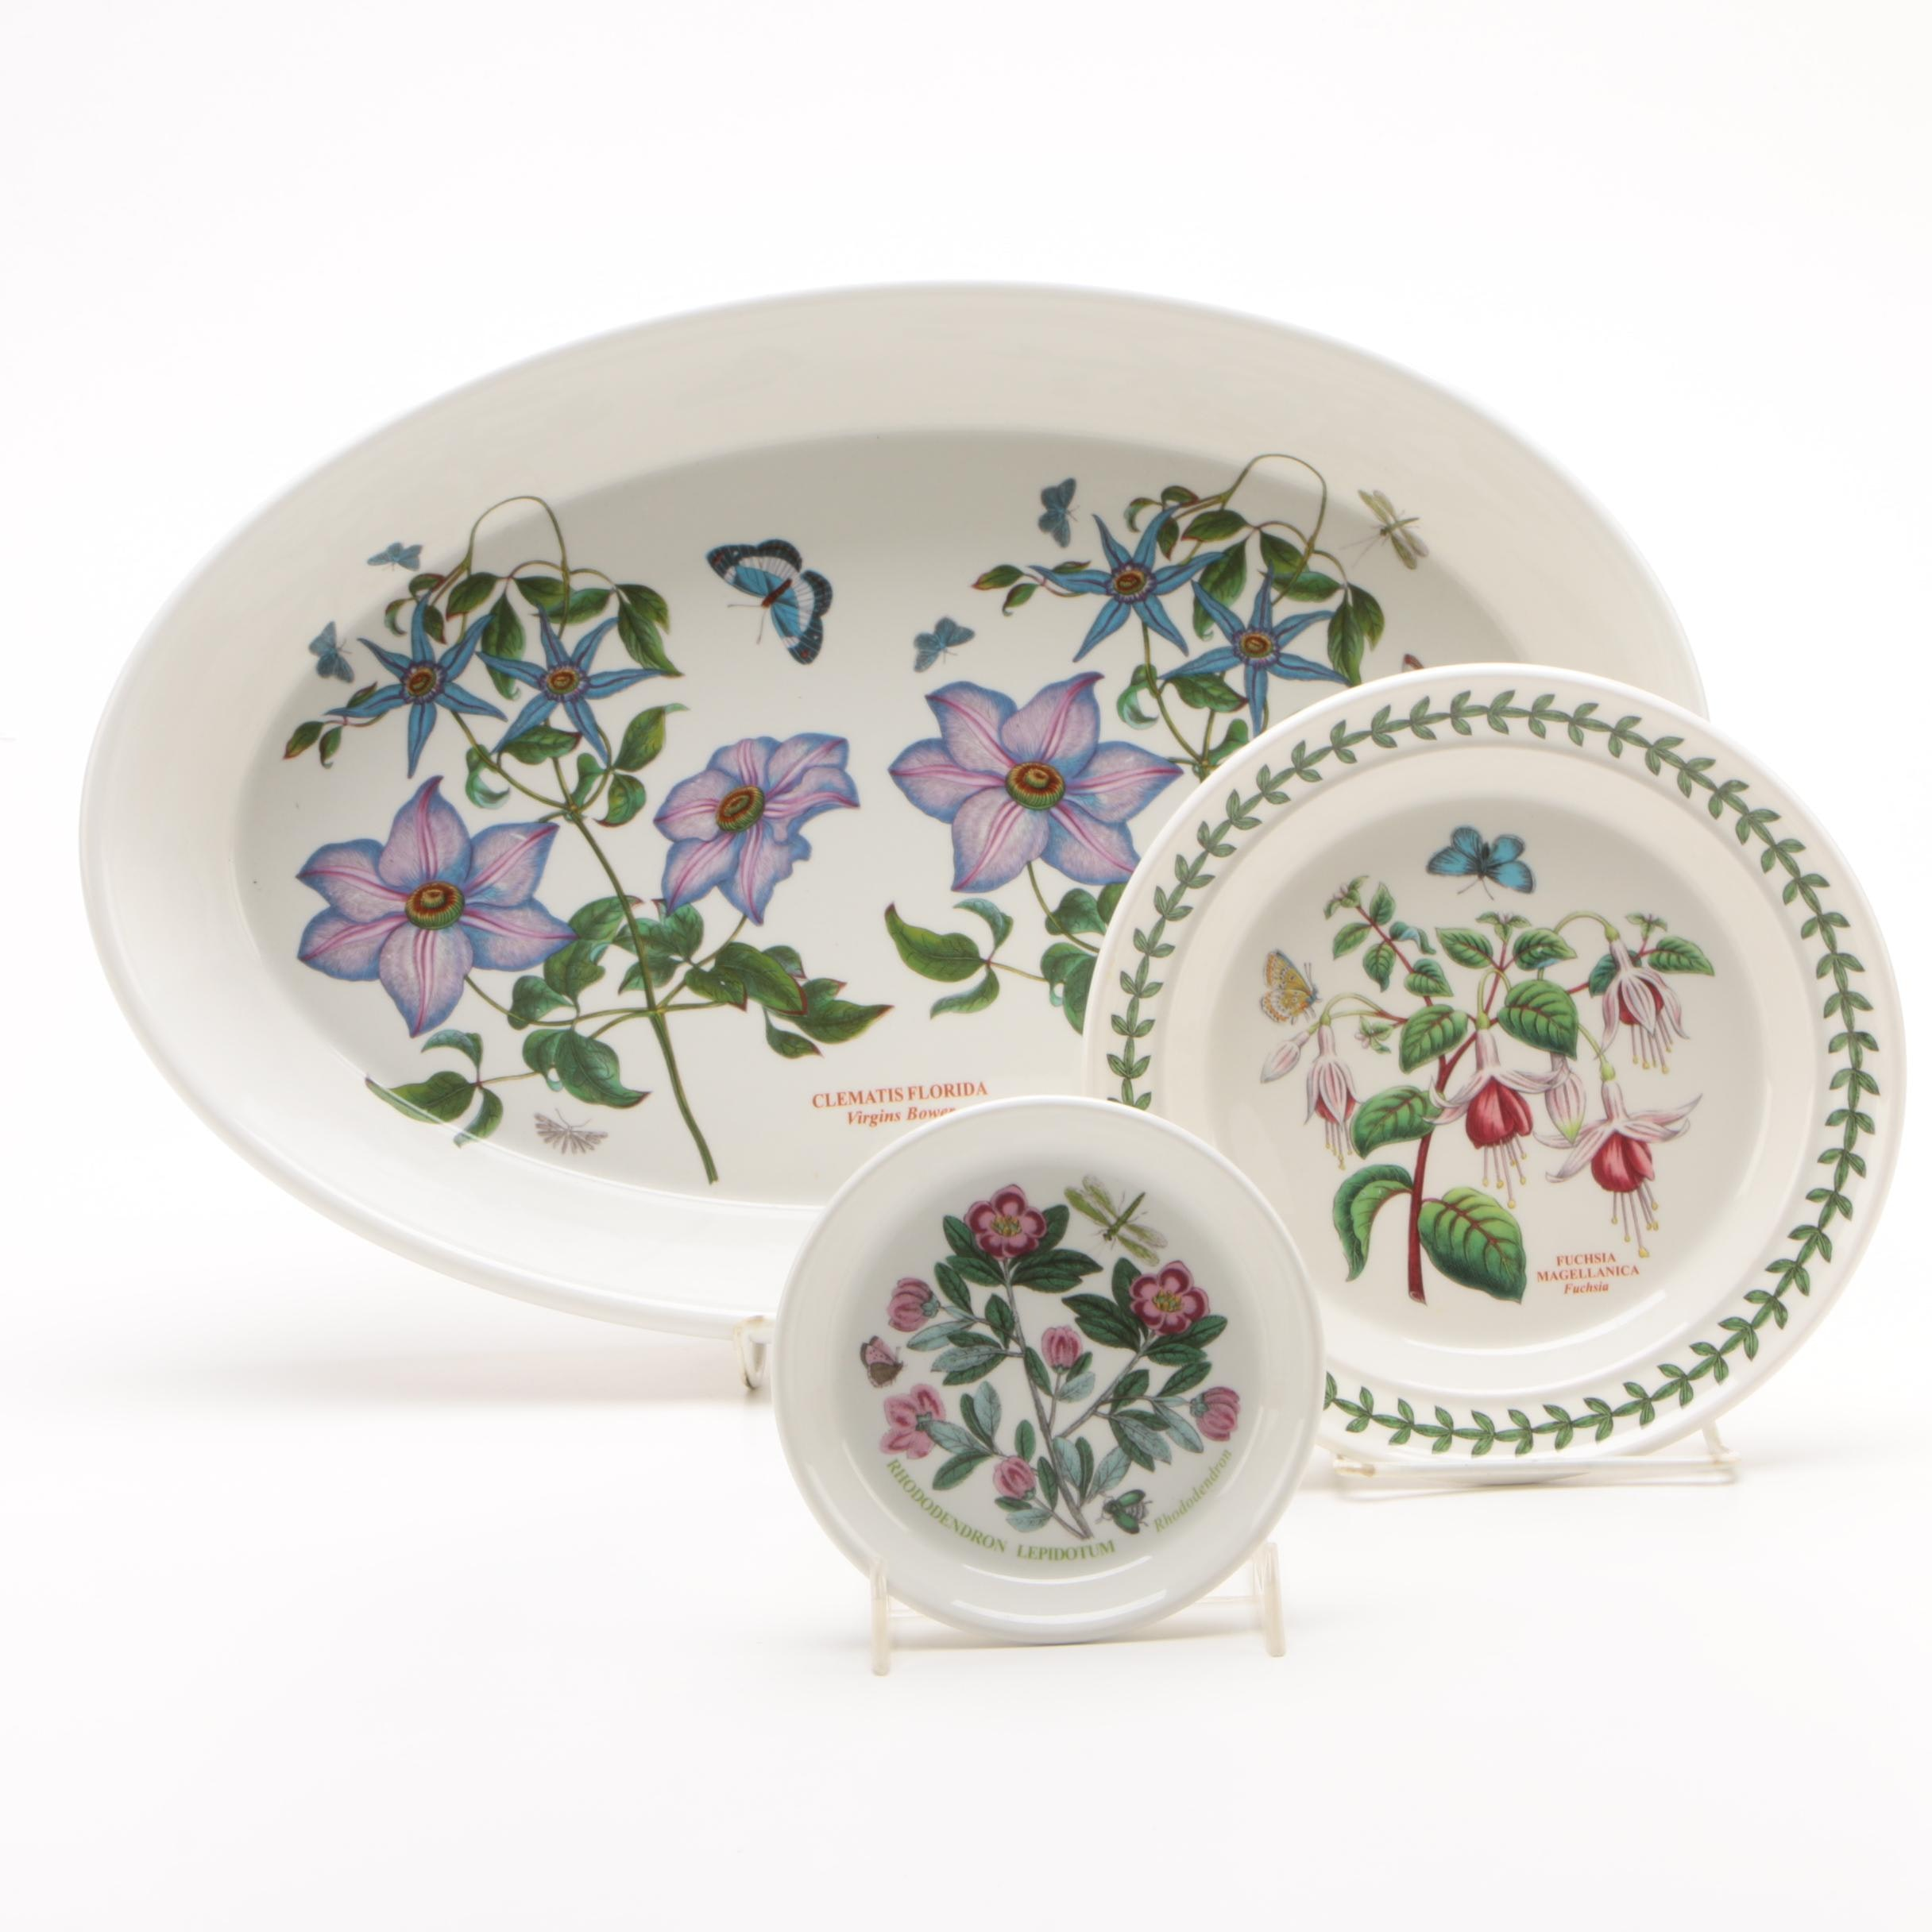 "Portmeirion Ceramic ""Botanic Garden"" Serving Plates and Baking Dish"